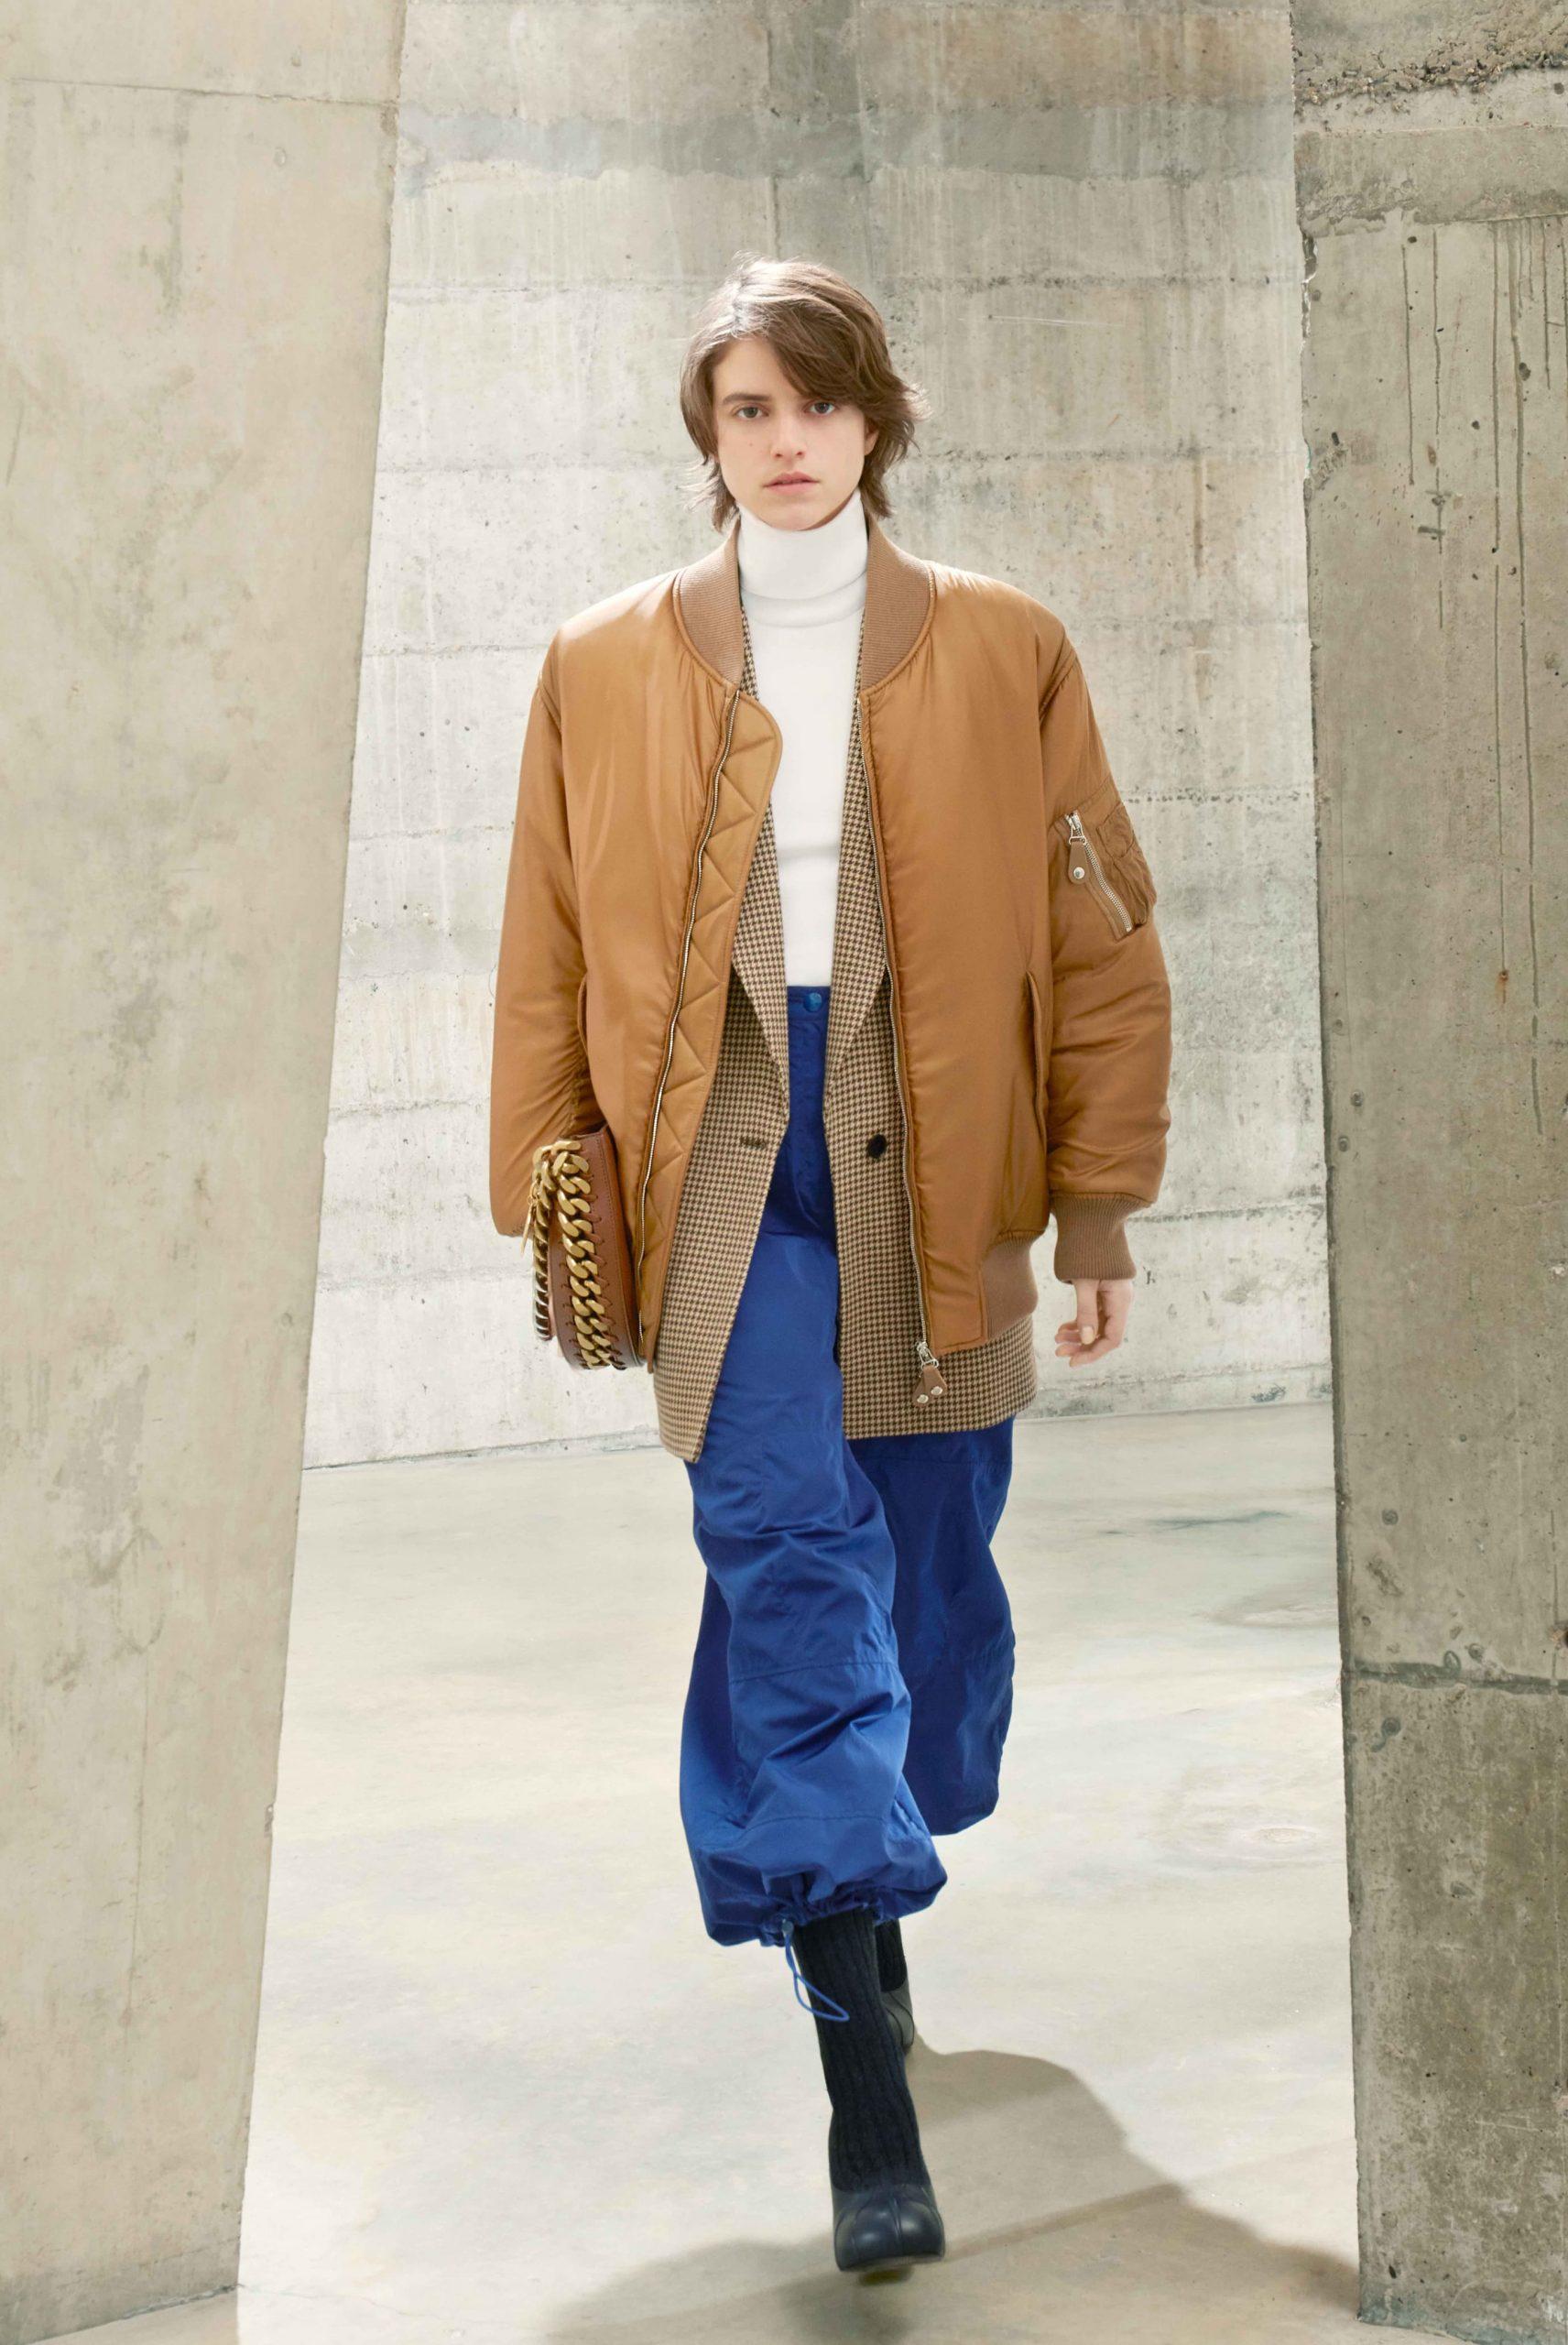 Stella McCartney Fall 2021 Fashion Show Photos